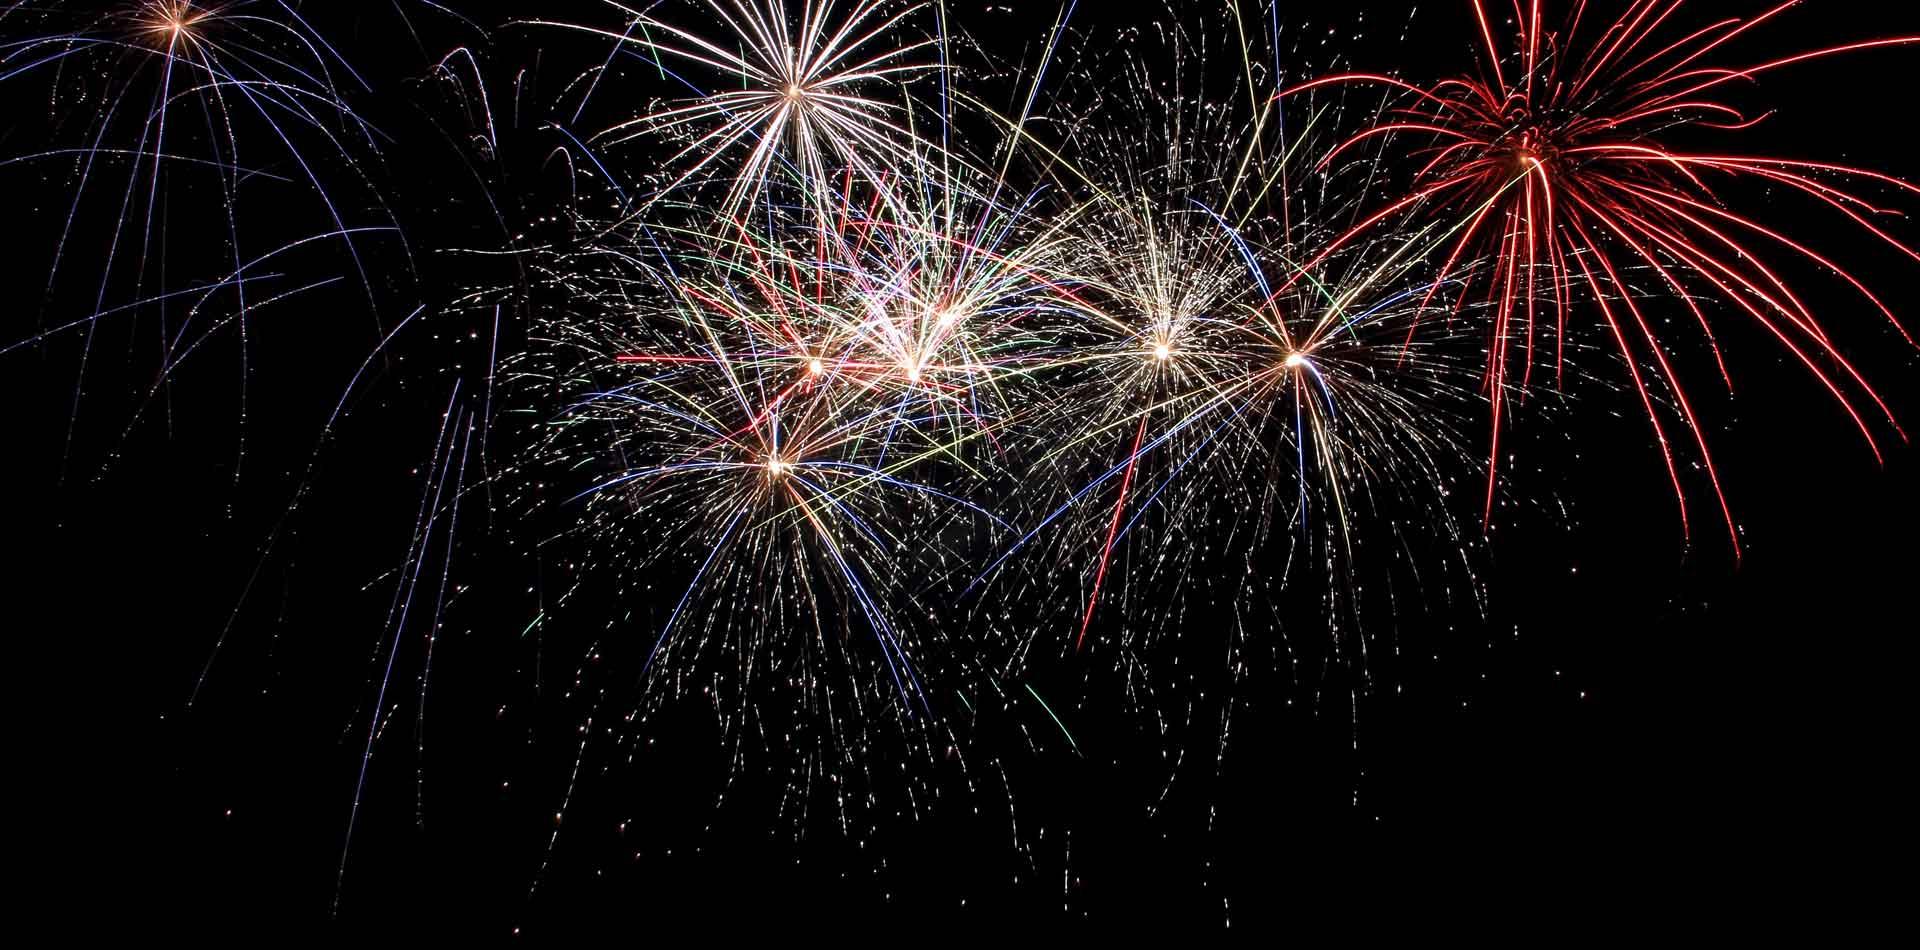 WPAC | Fireworks